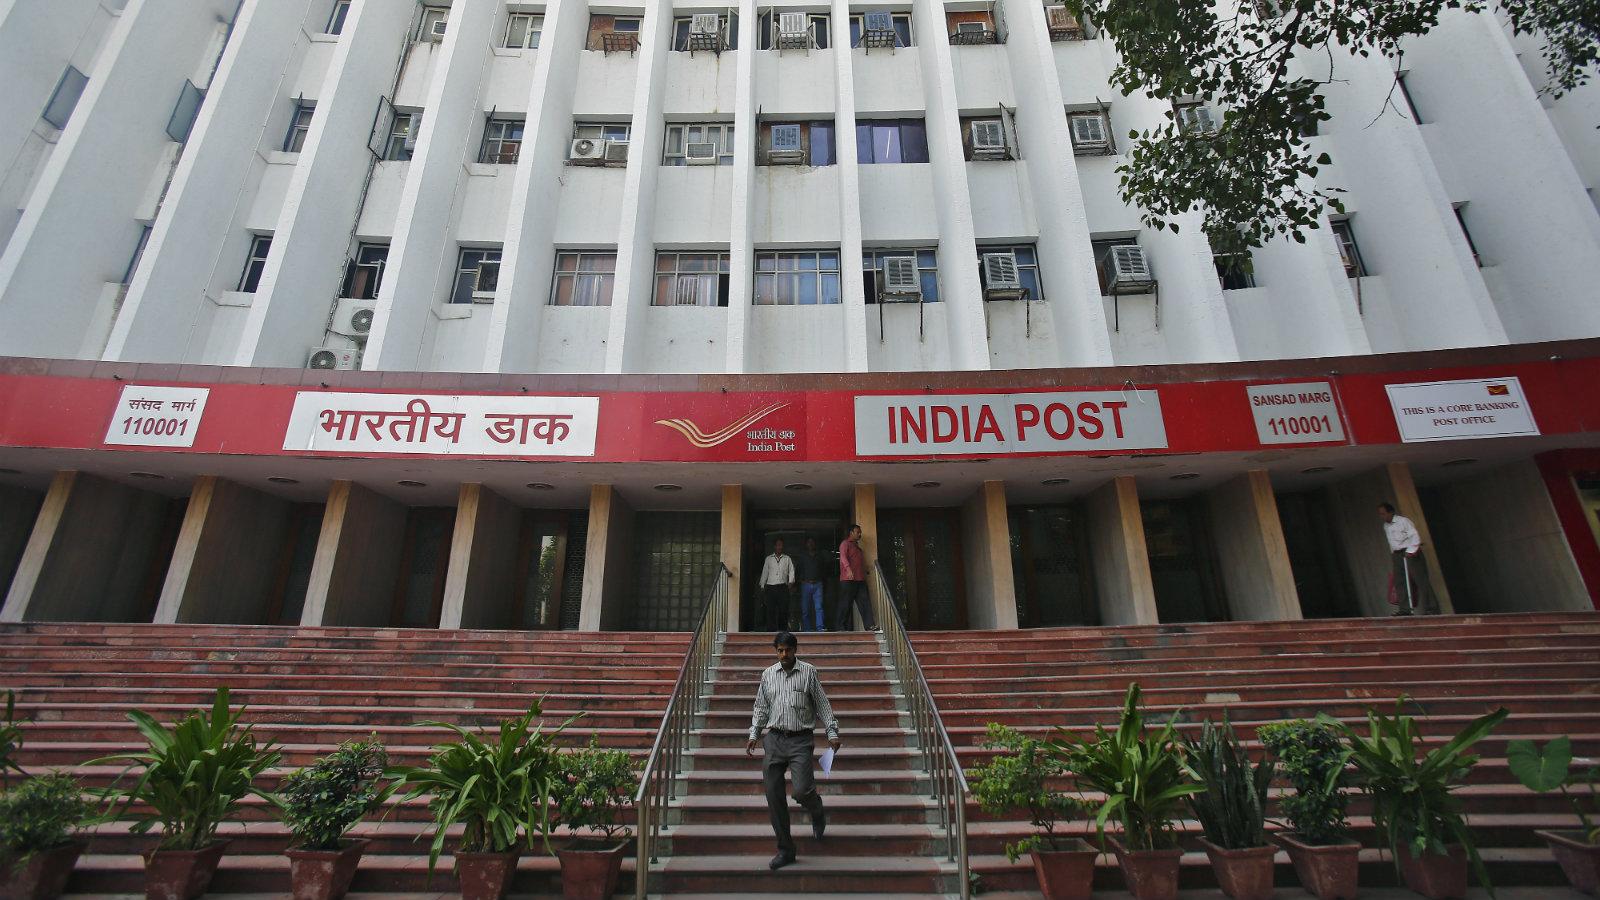 India-postal services